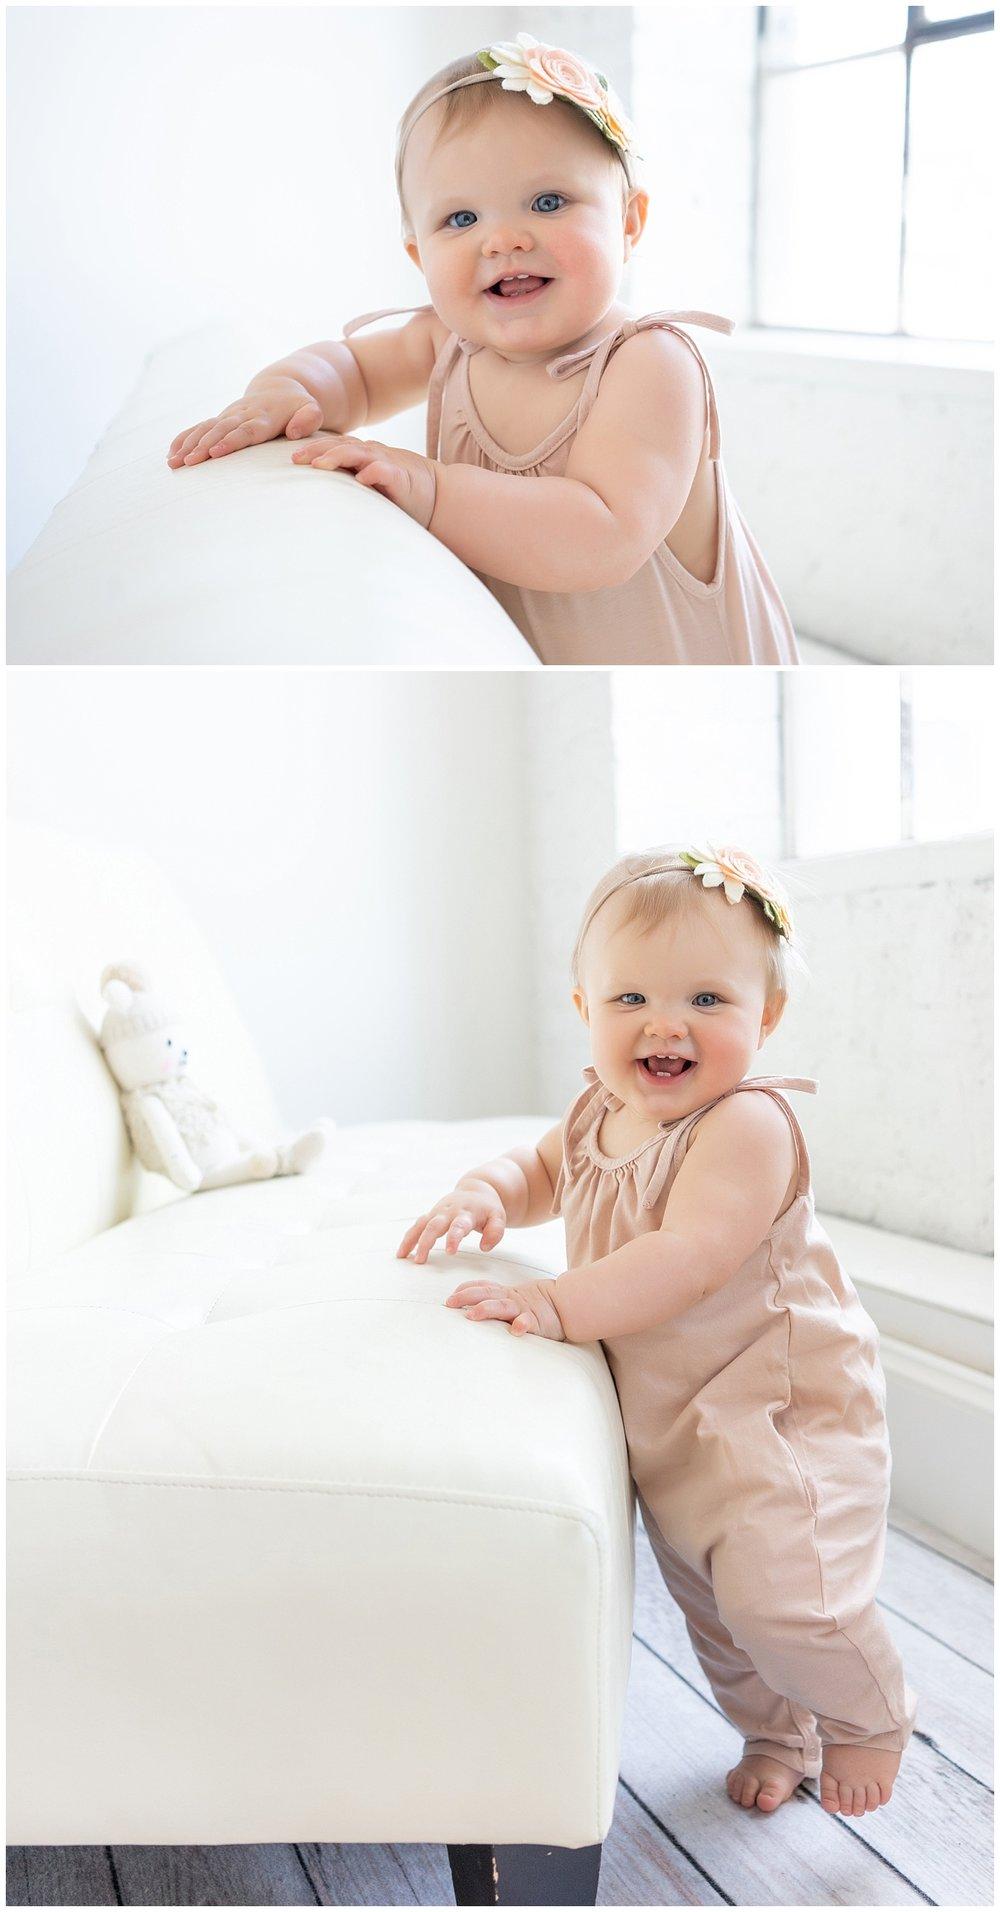 minneapolis_baby_and_family_portraits.jpg